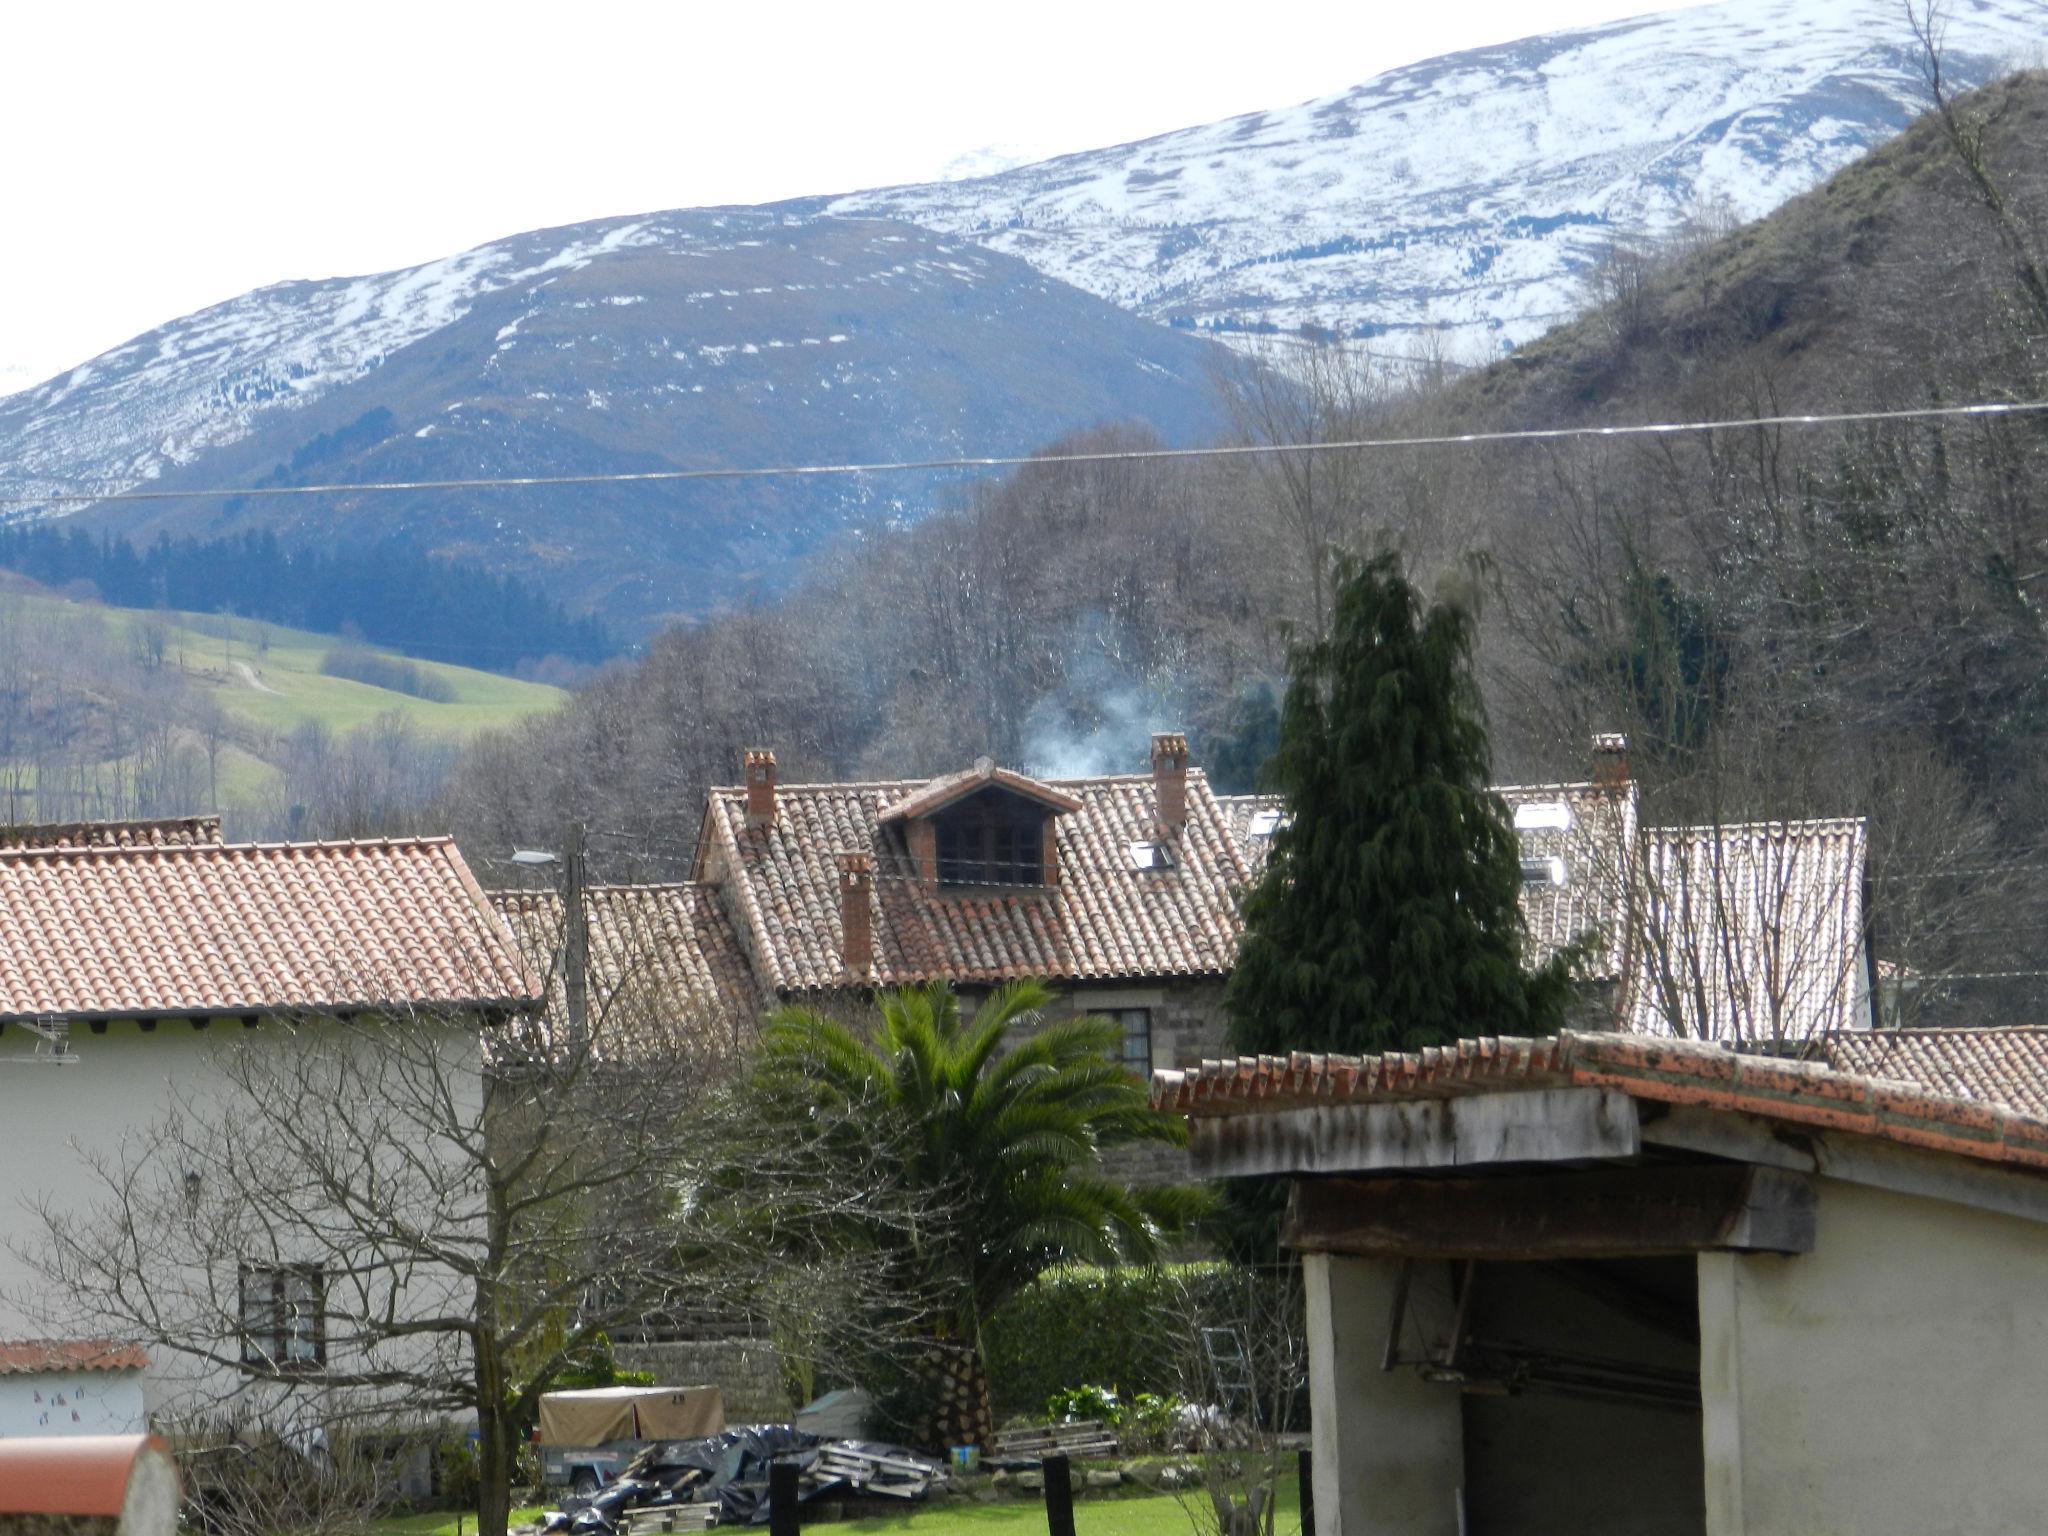 Fotos de casa ter n cantabria cabuerniga clubrural - Casas rurales cantabria baratas alquiler integro ...